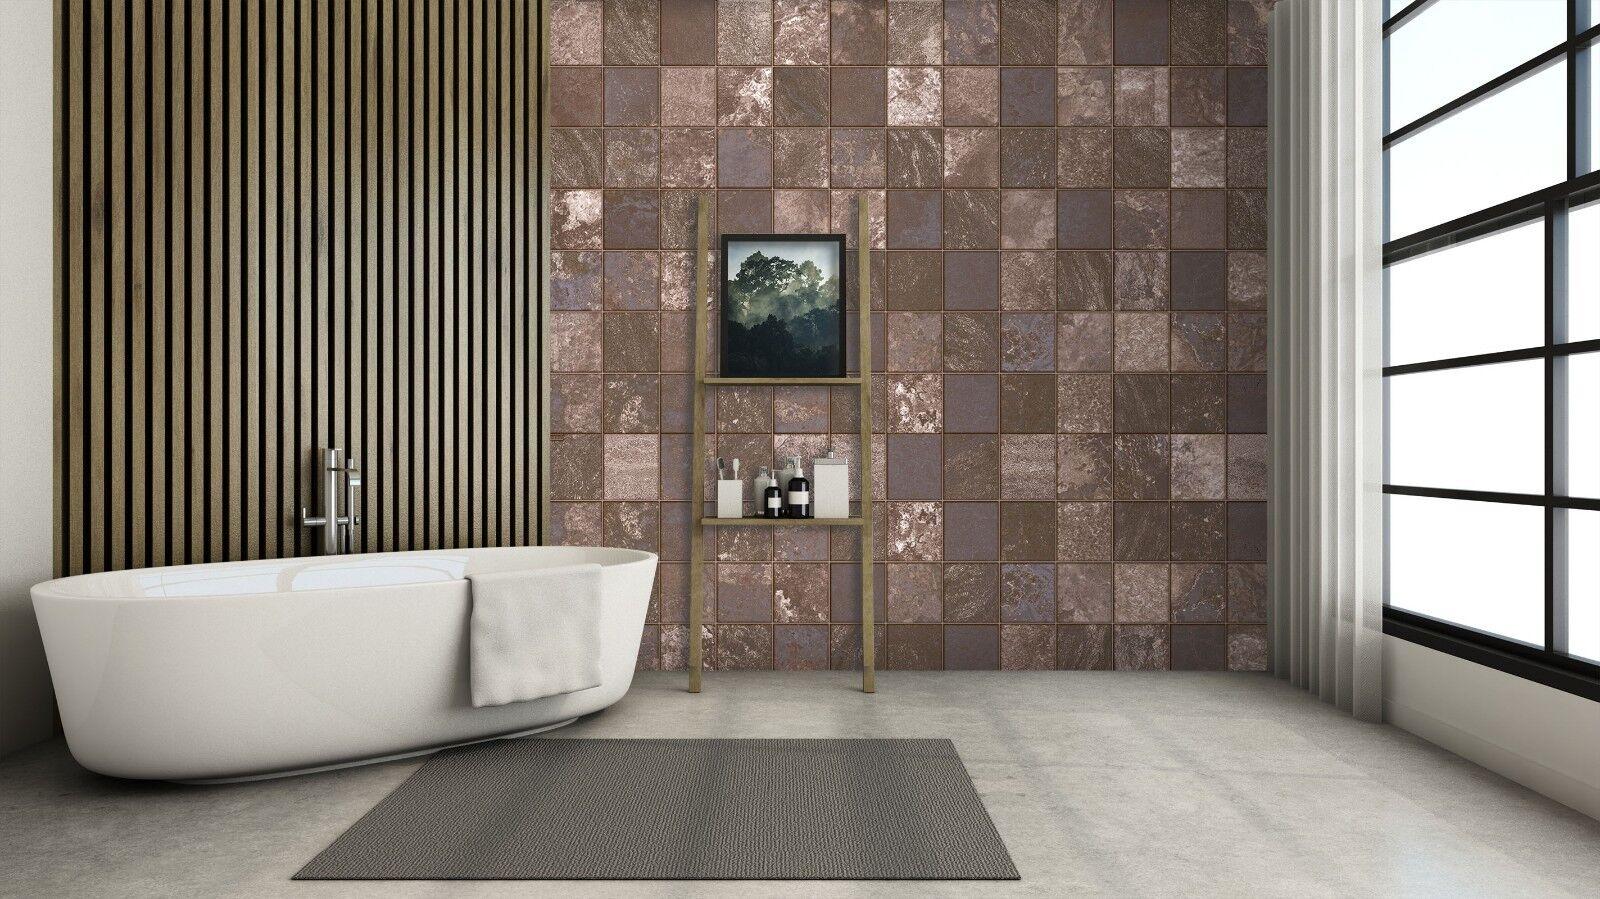 3D Retro braun Quadrat 2 Textur Fliesen Marmor Tapete Abziehbild Tapete Wandbild